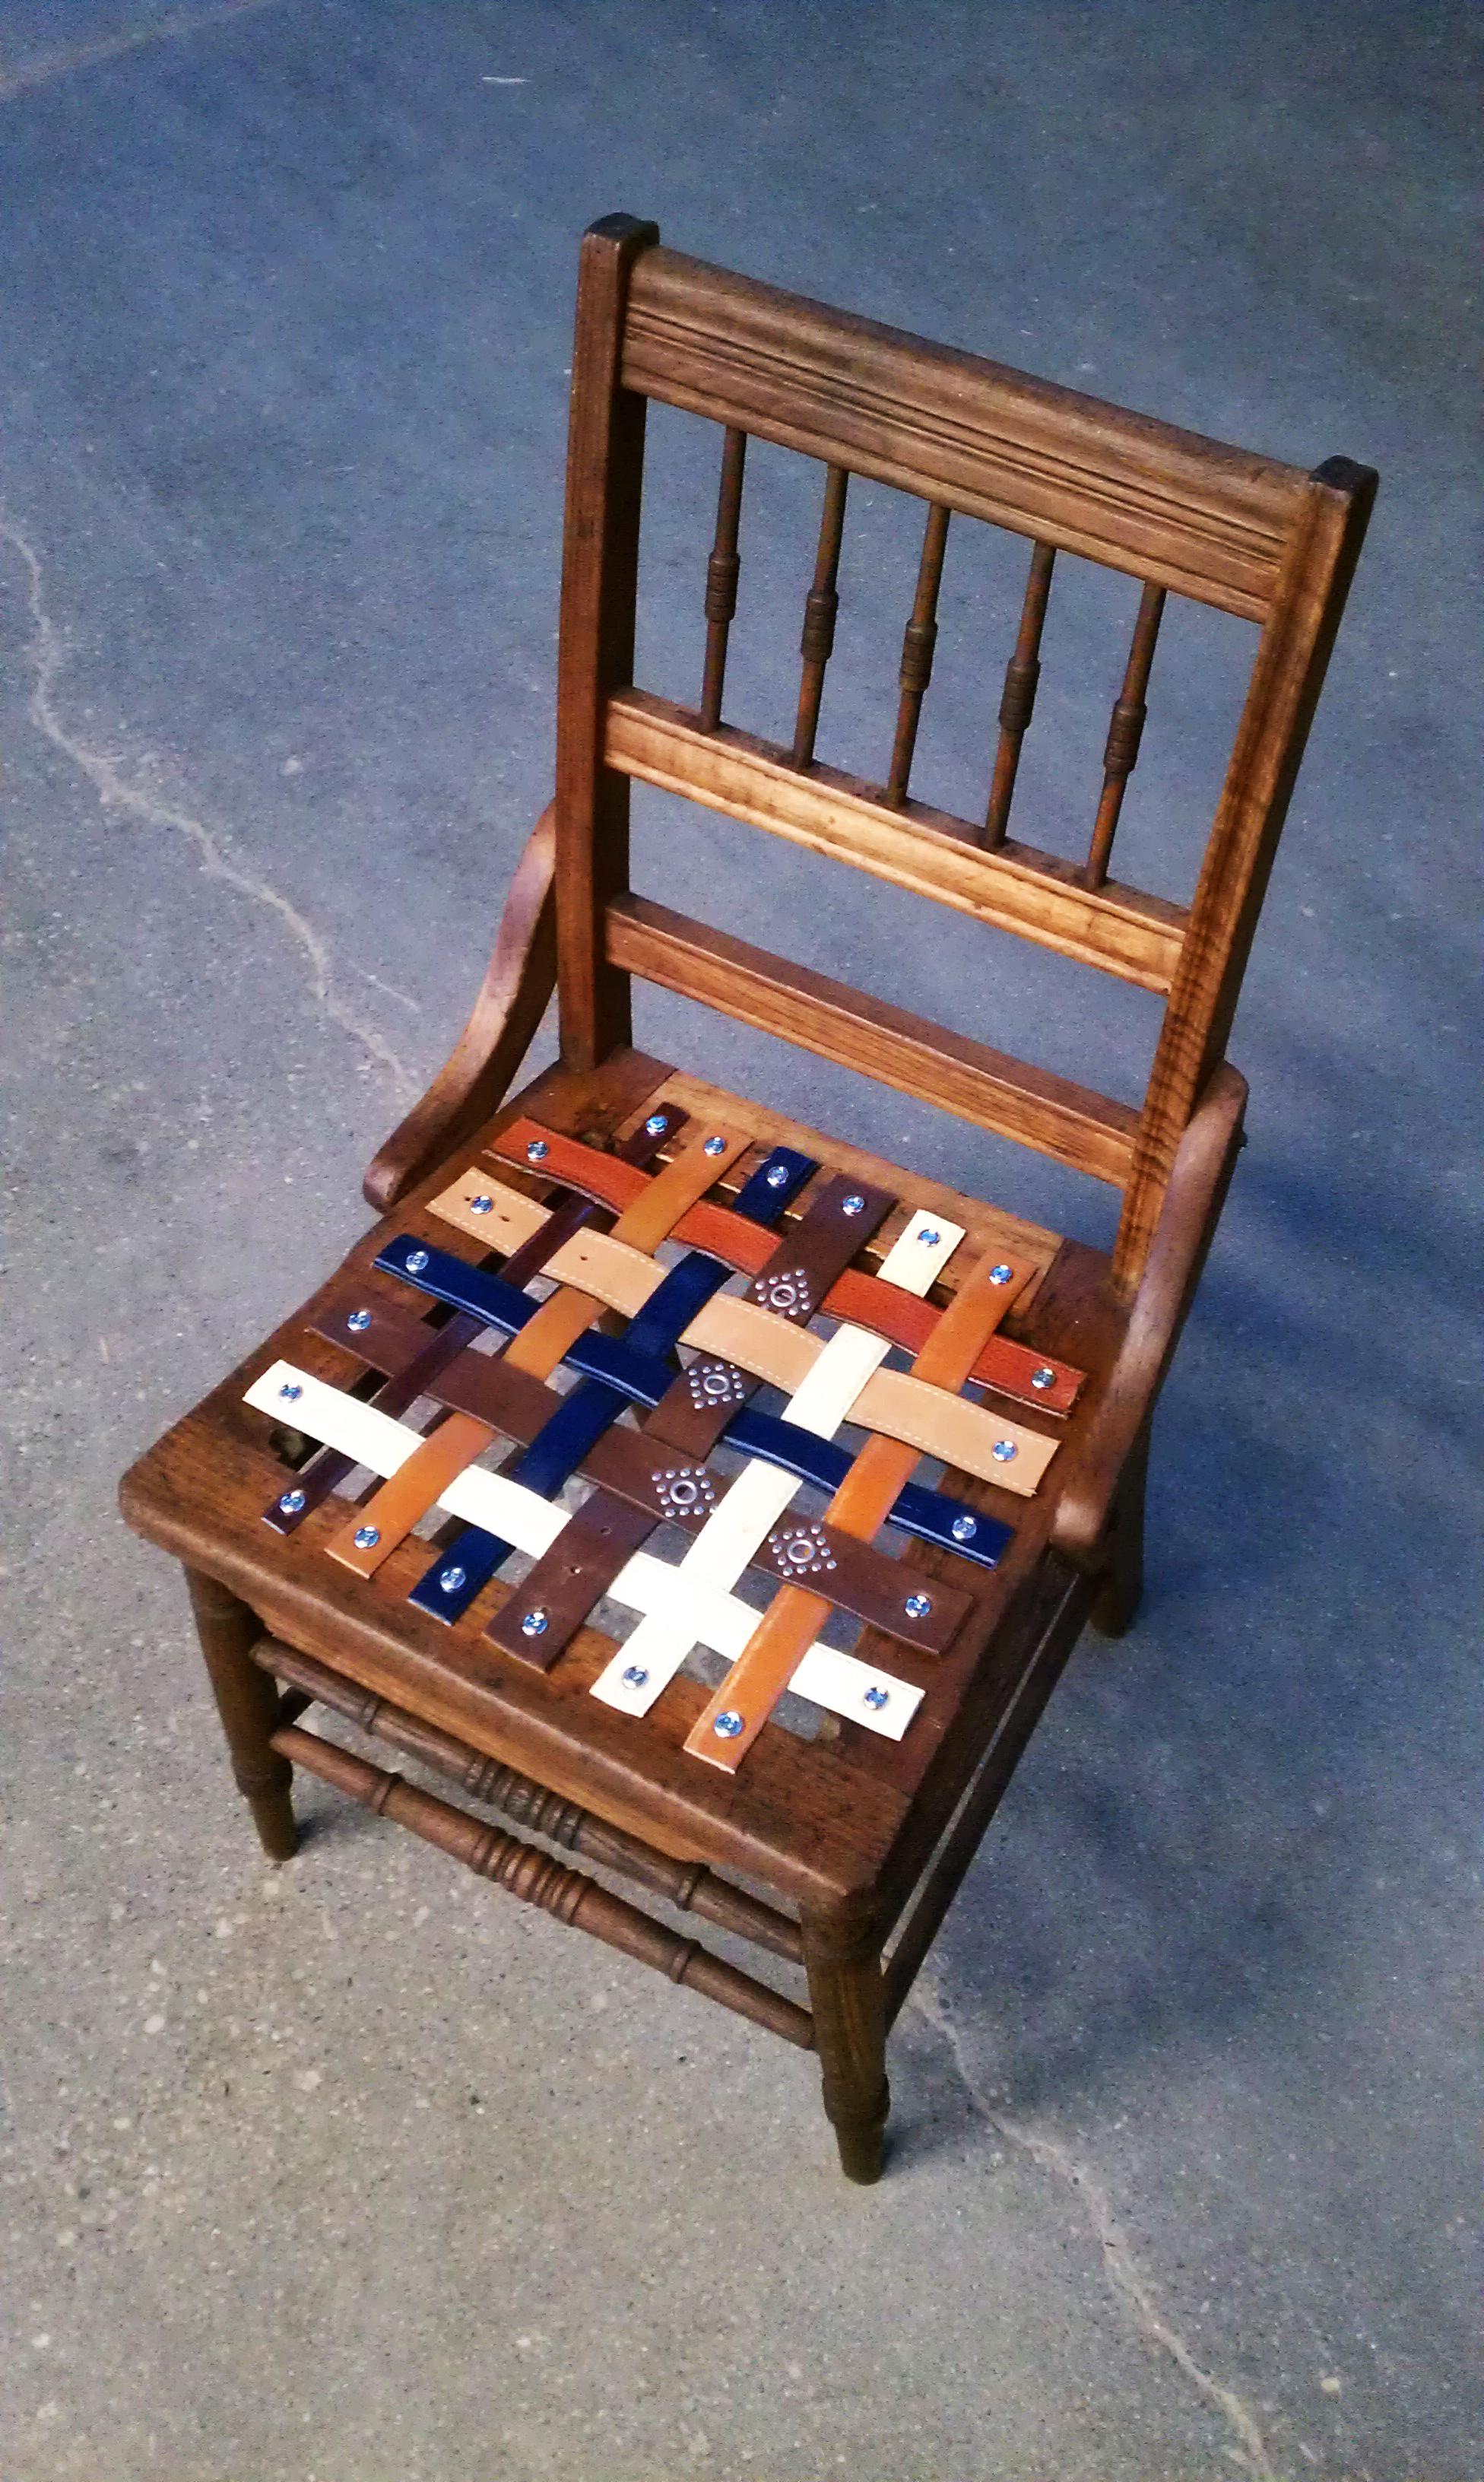 walnut-chair